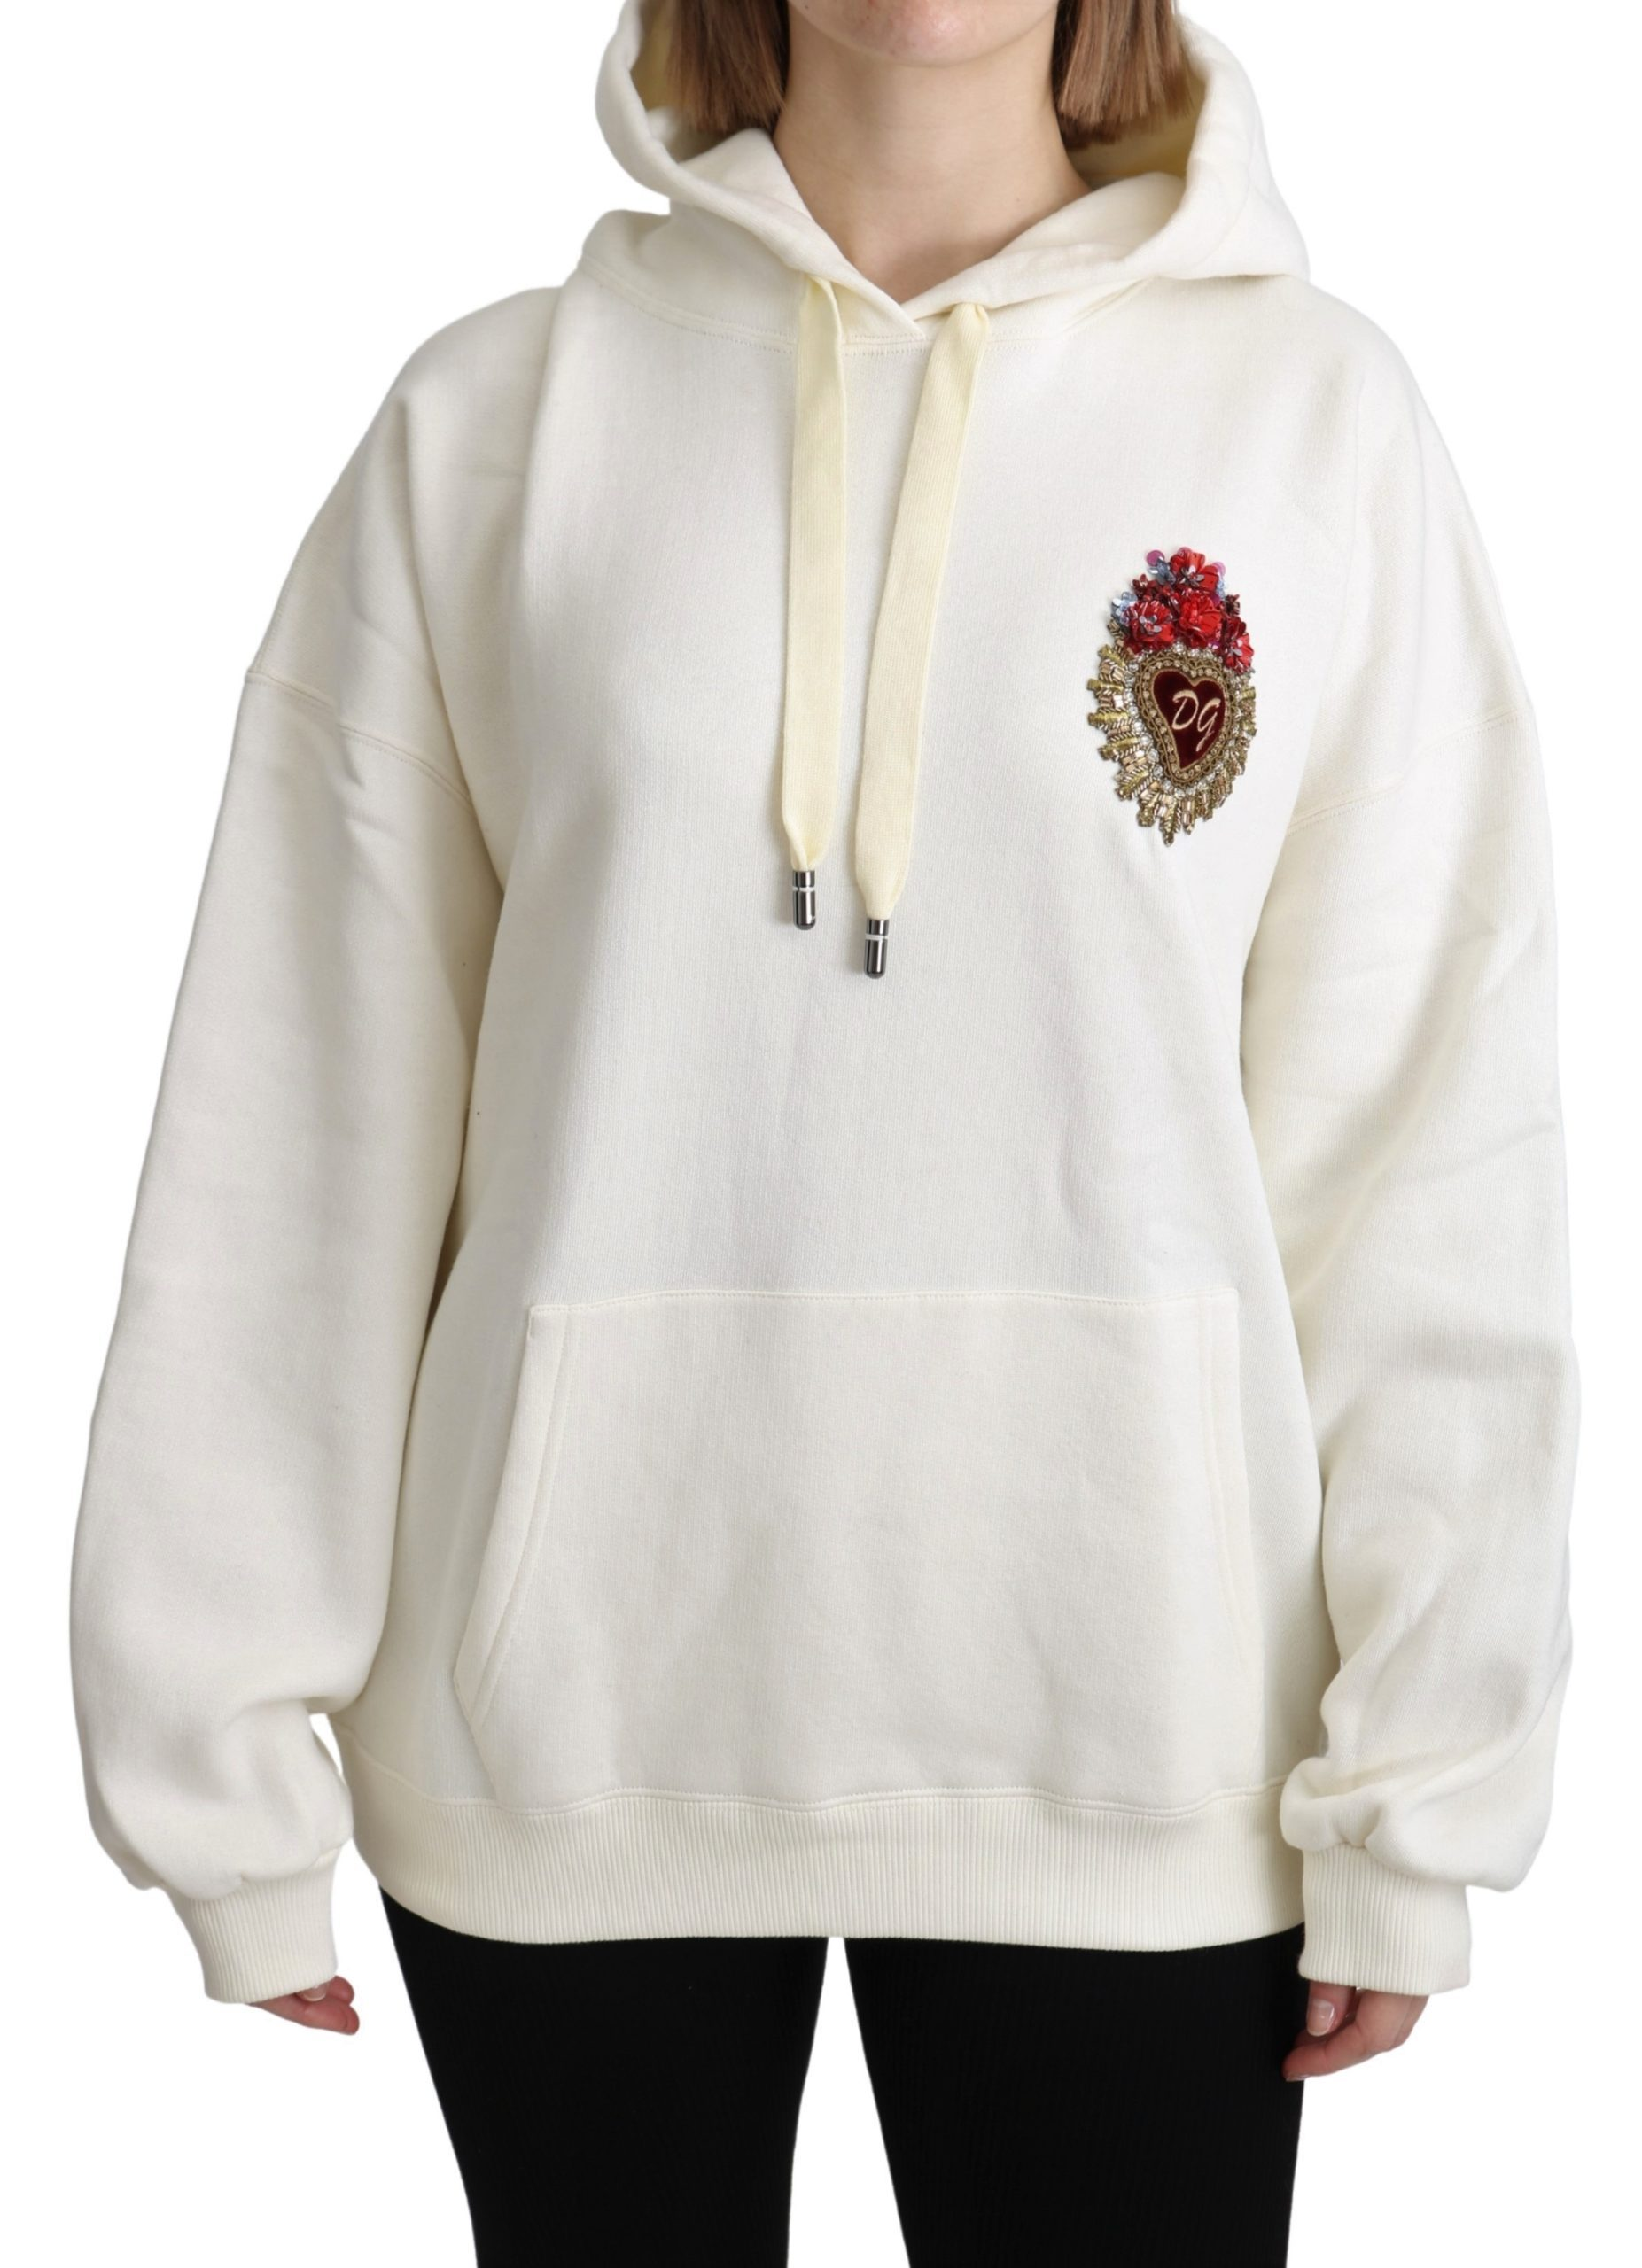 Dolce & Gabbana Women's Crystal Heart Hooded Pullover Sweater White TSH5155 - IT40|S